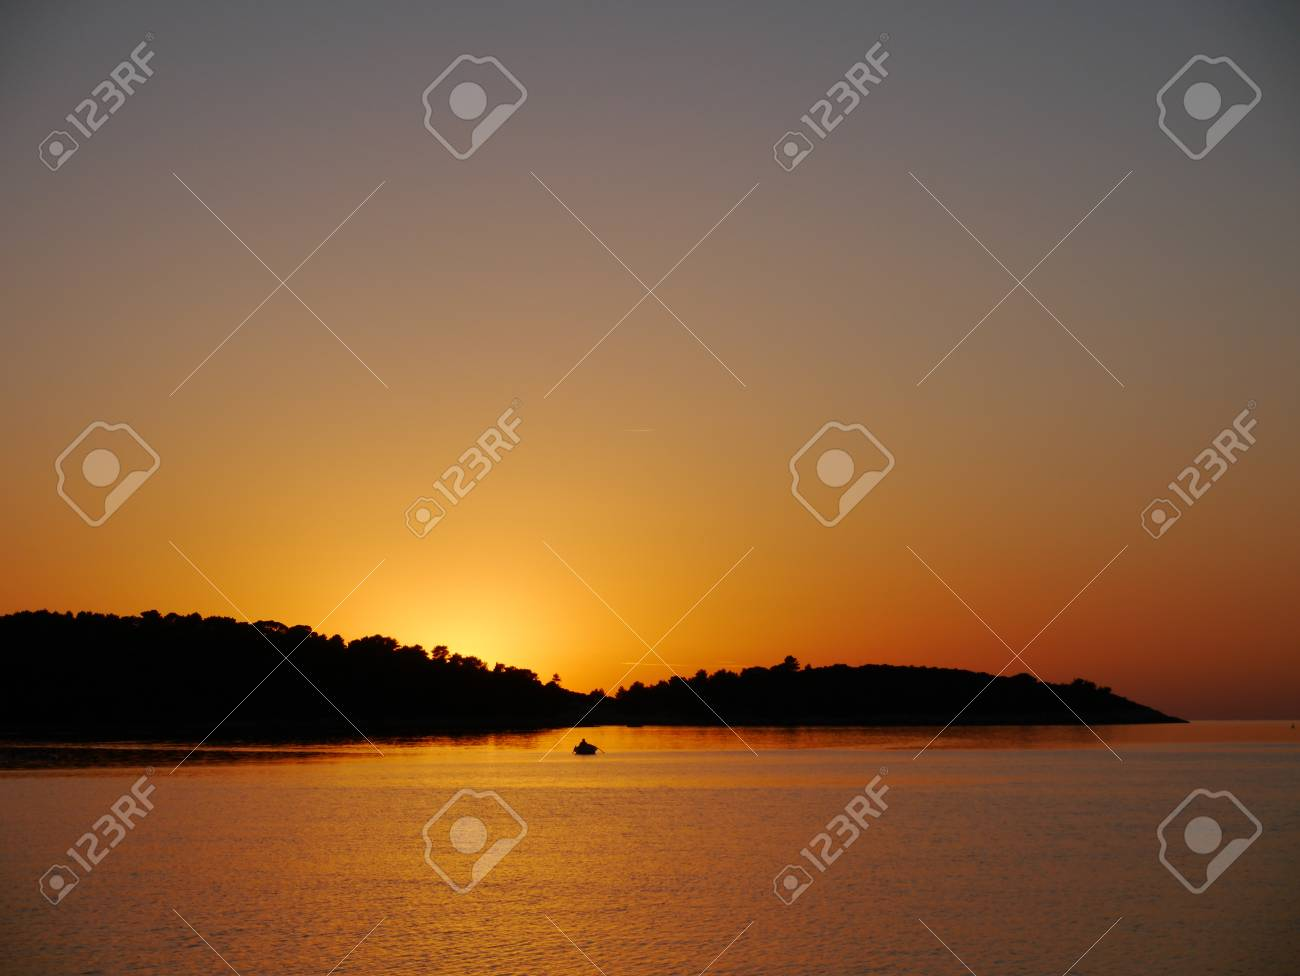 sunset in the Adriatic archipelago of Croatia in the Mediterranean Stock Photo - 16813985